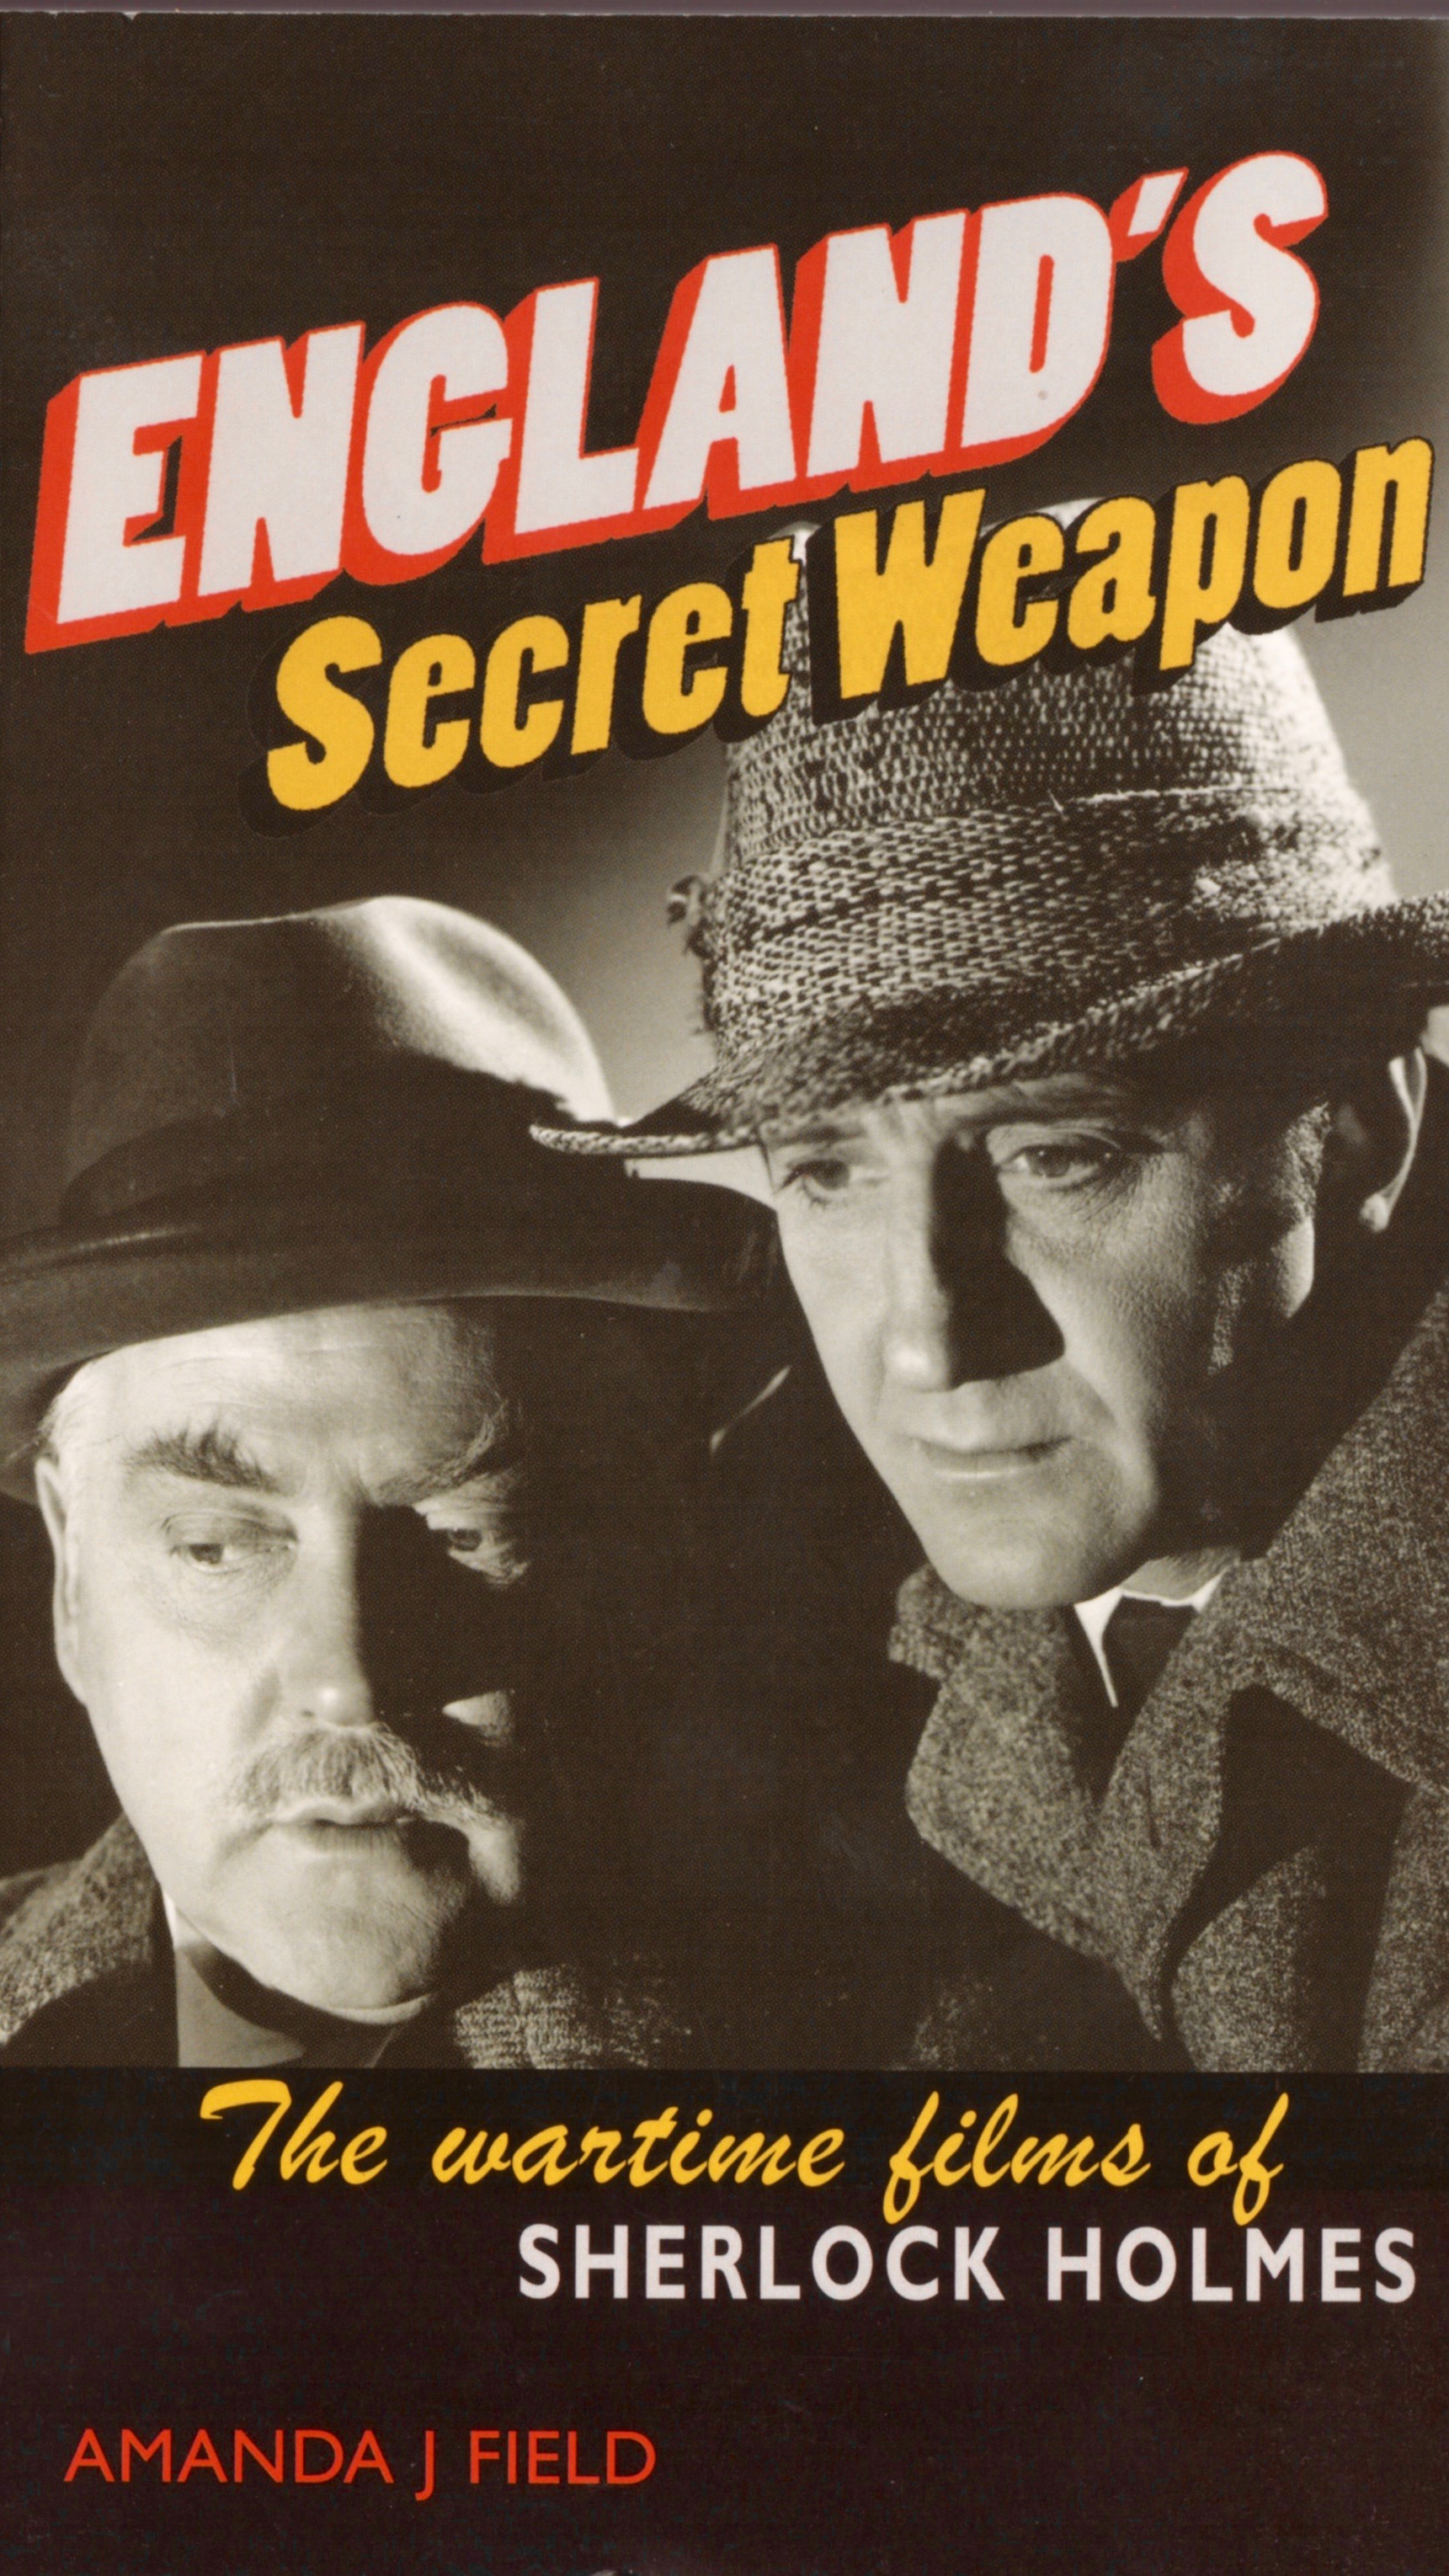 Englands Secreat Weapon cover American Library Assoc. program.jpeg